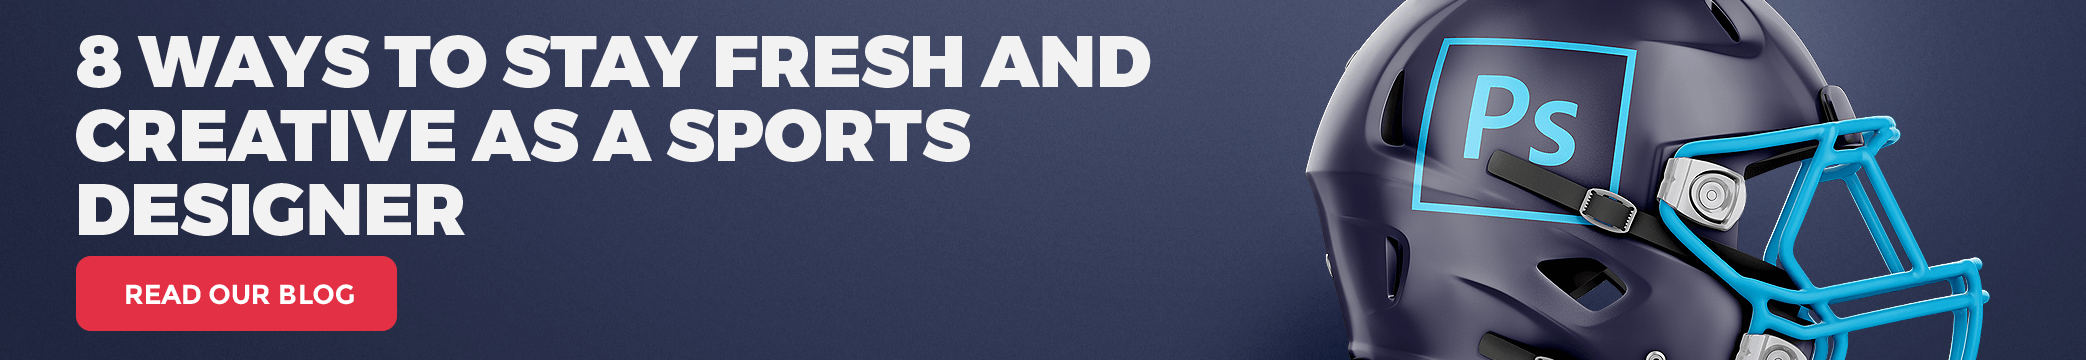 Sports Templates Blog